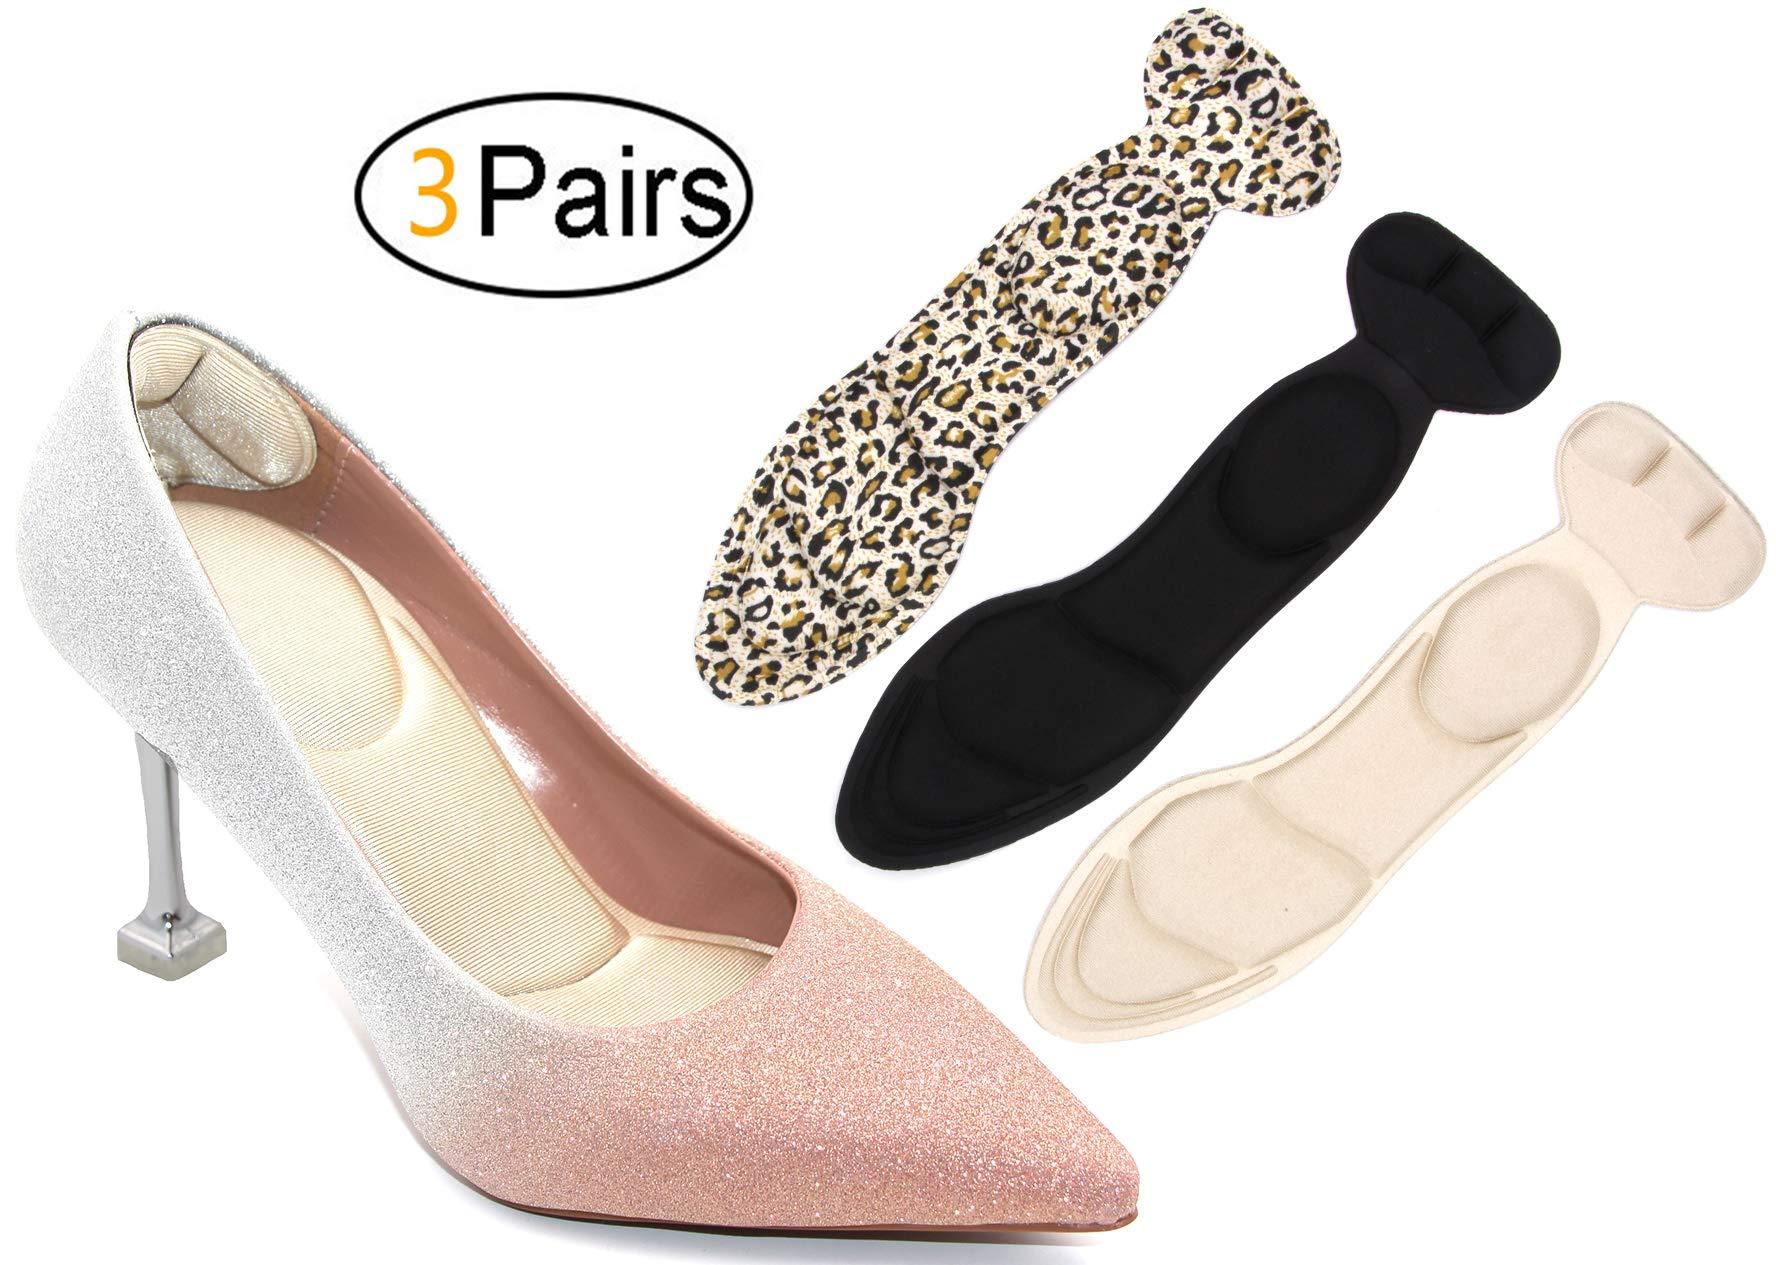 Heel Cushion Inserts - Heel Grips & Shoe Pads for Women-Heel Pads Non-Slip Sponge Insole 2 in 1 by 10AGIRL